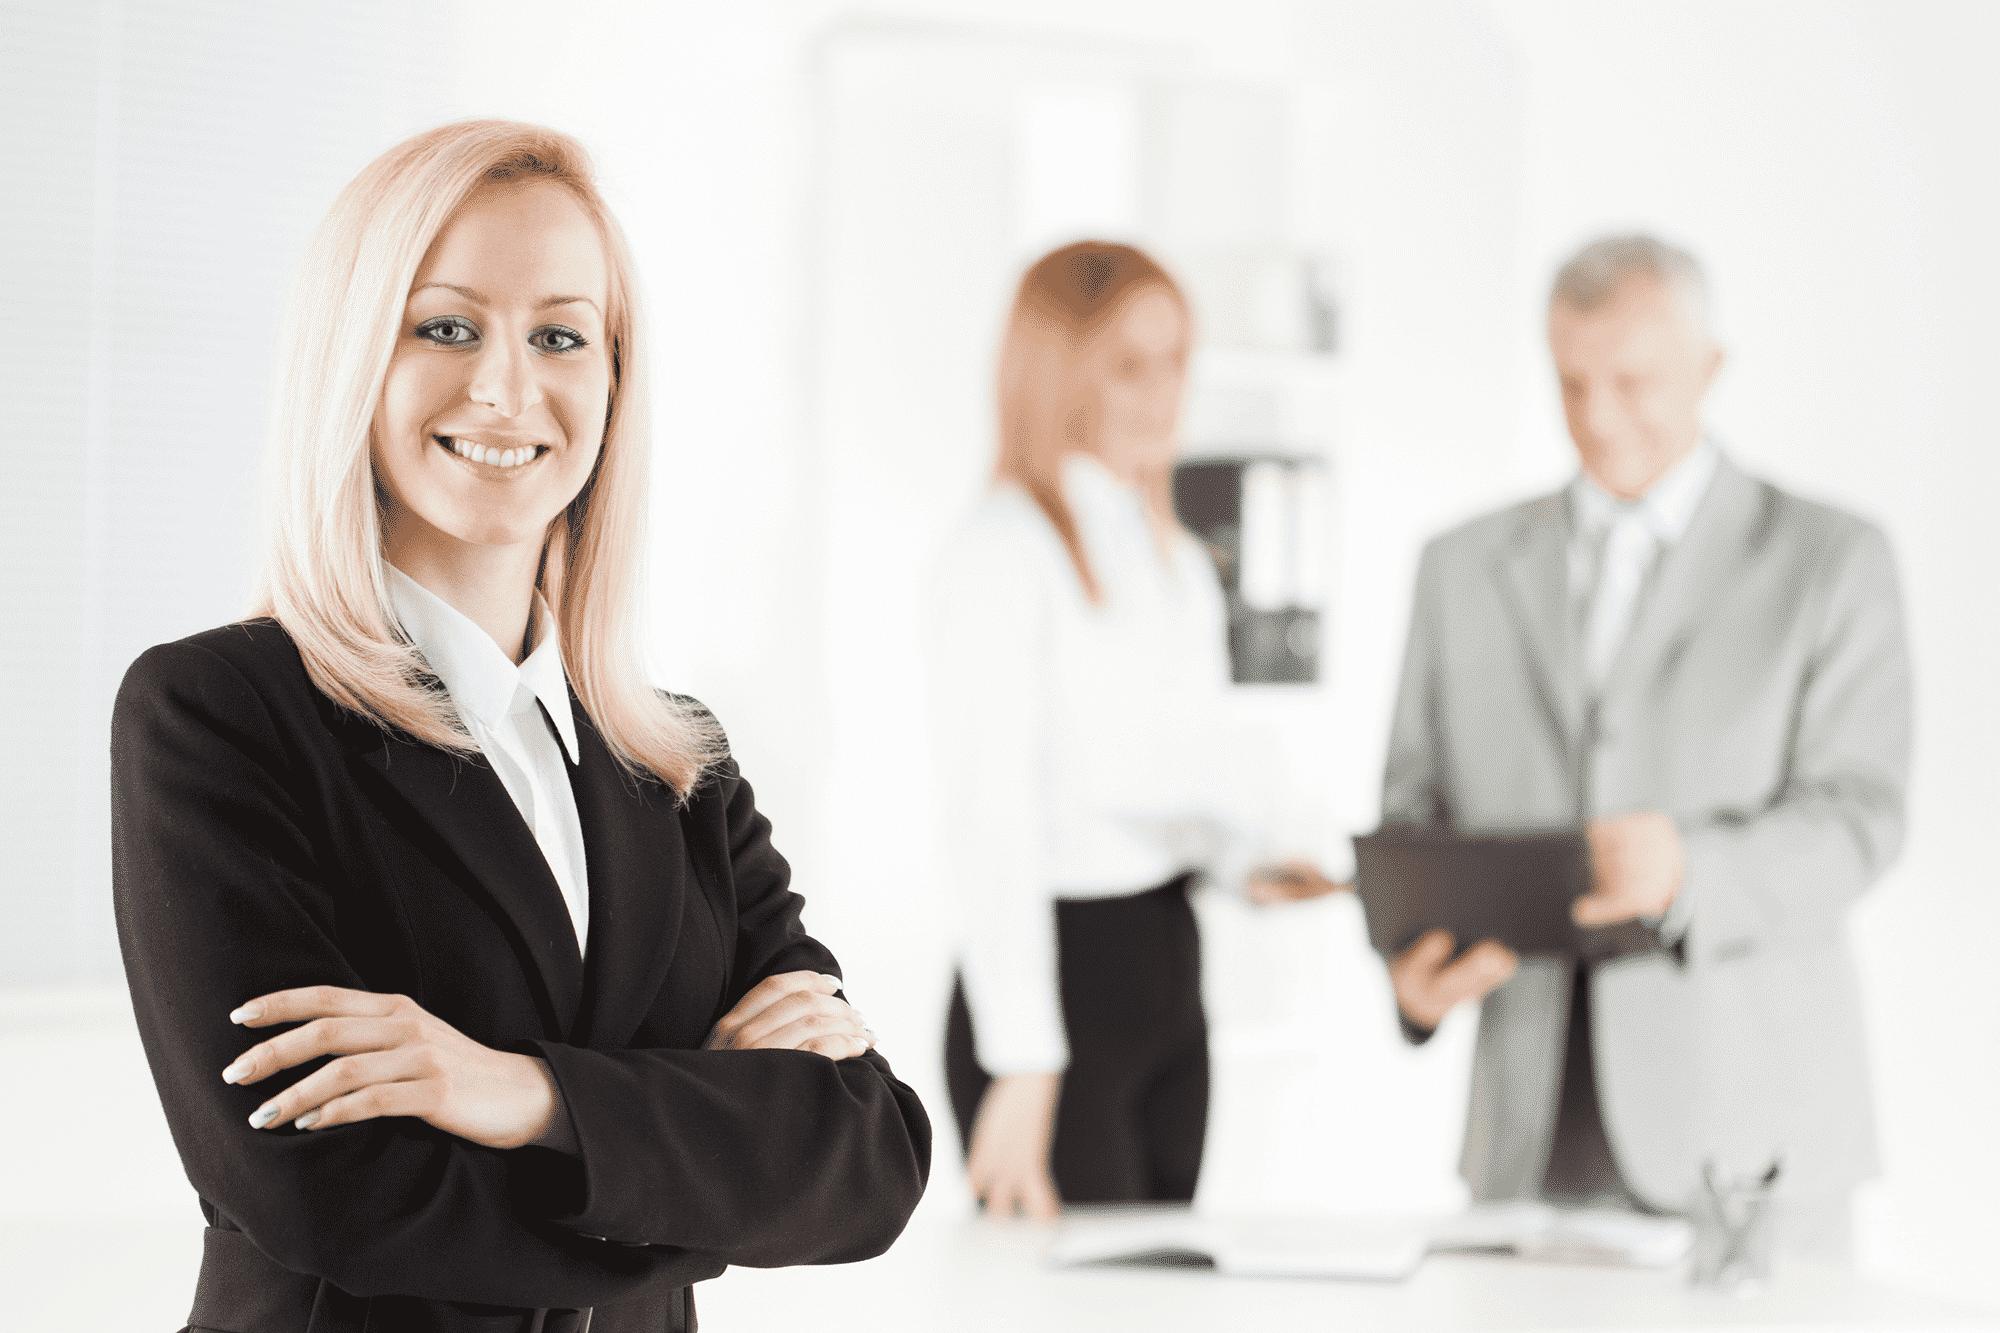 PDCA principes & succes | 4 factoren die elke manager moet kennen